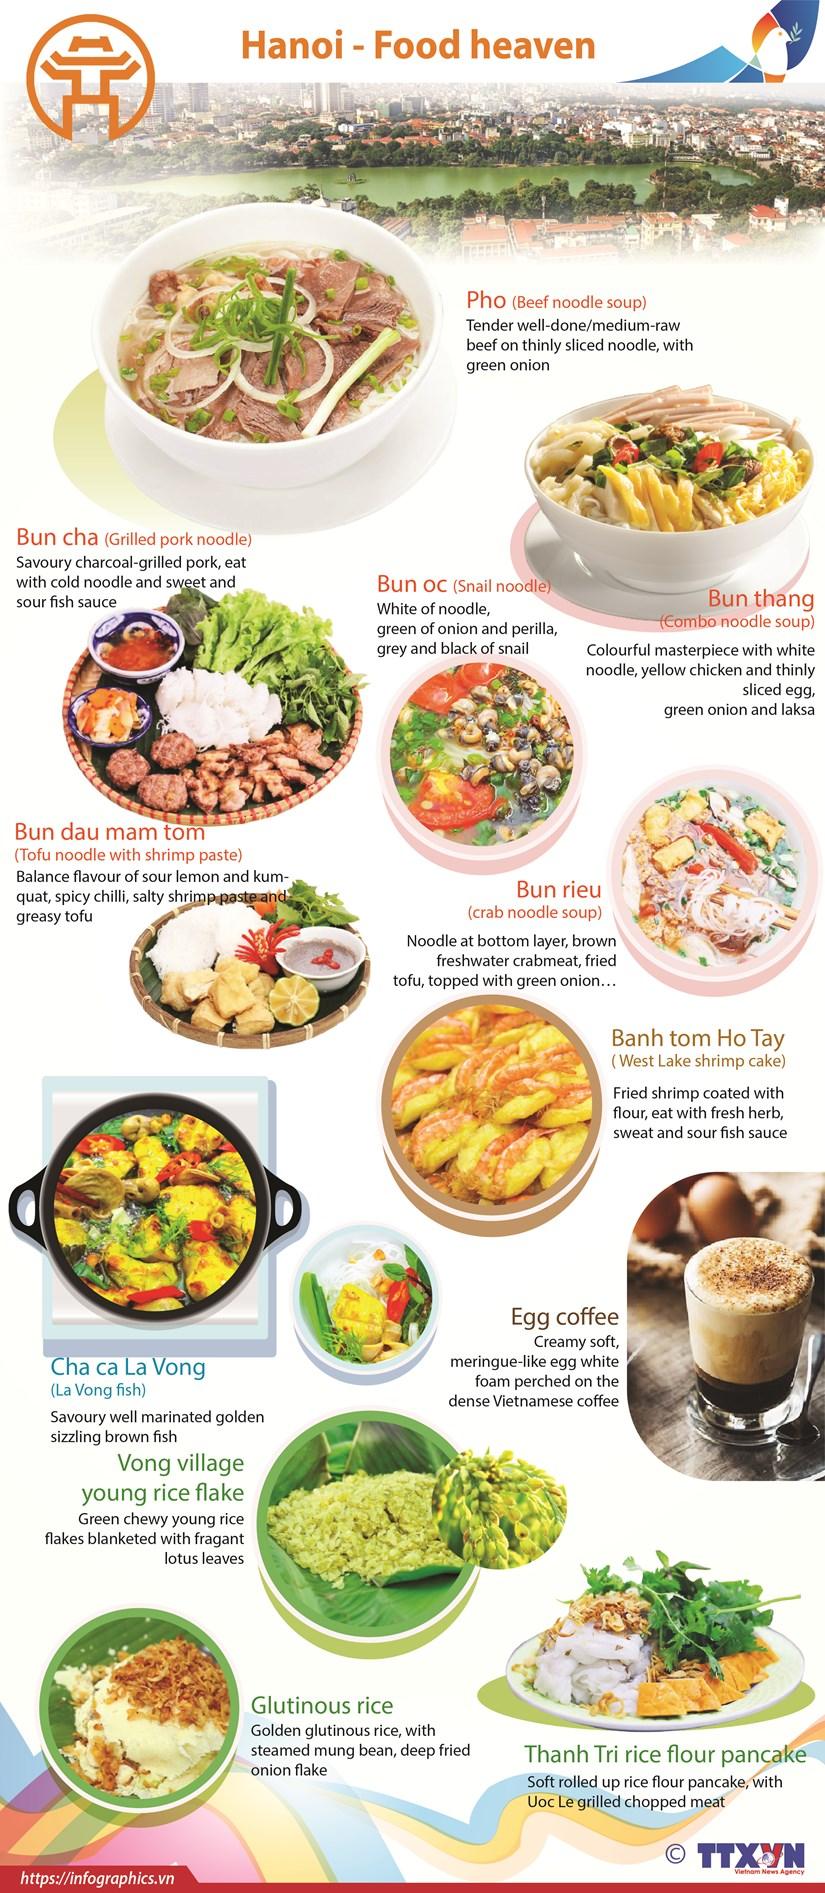 Hanoi - Food heaven hinh anh 1